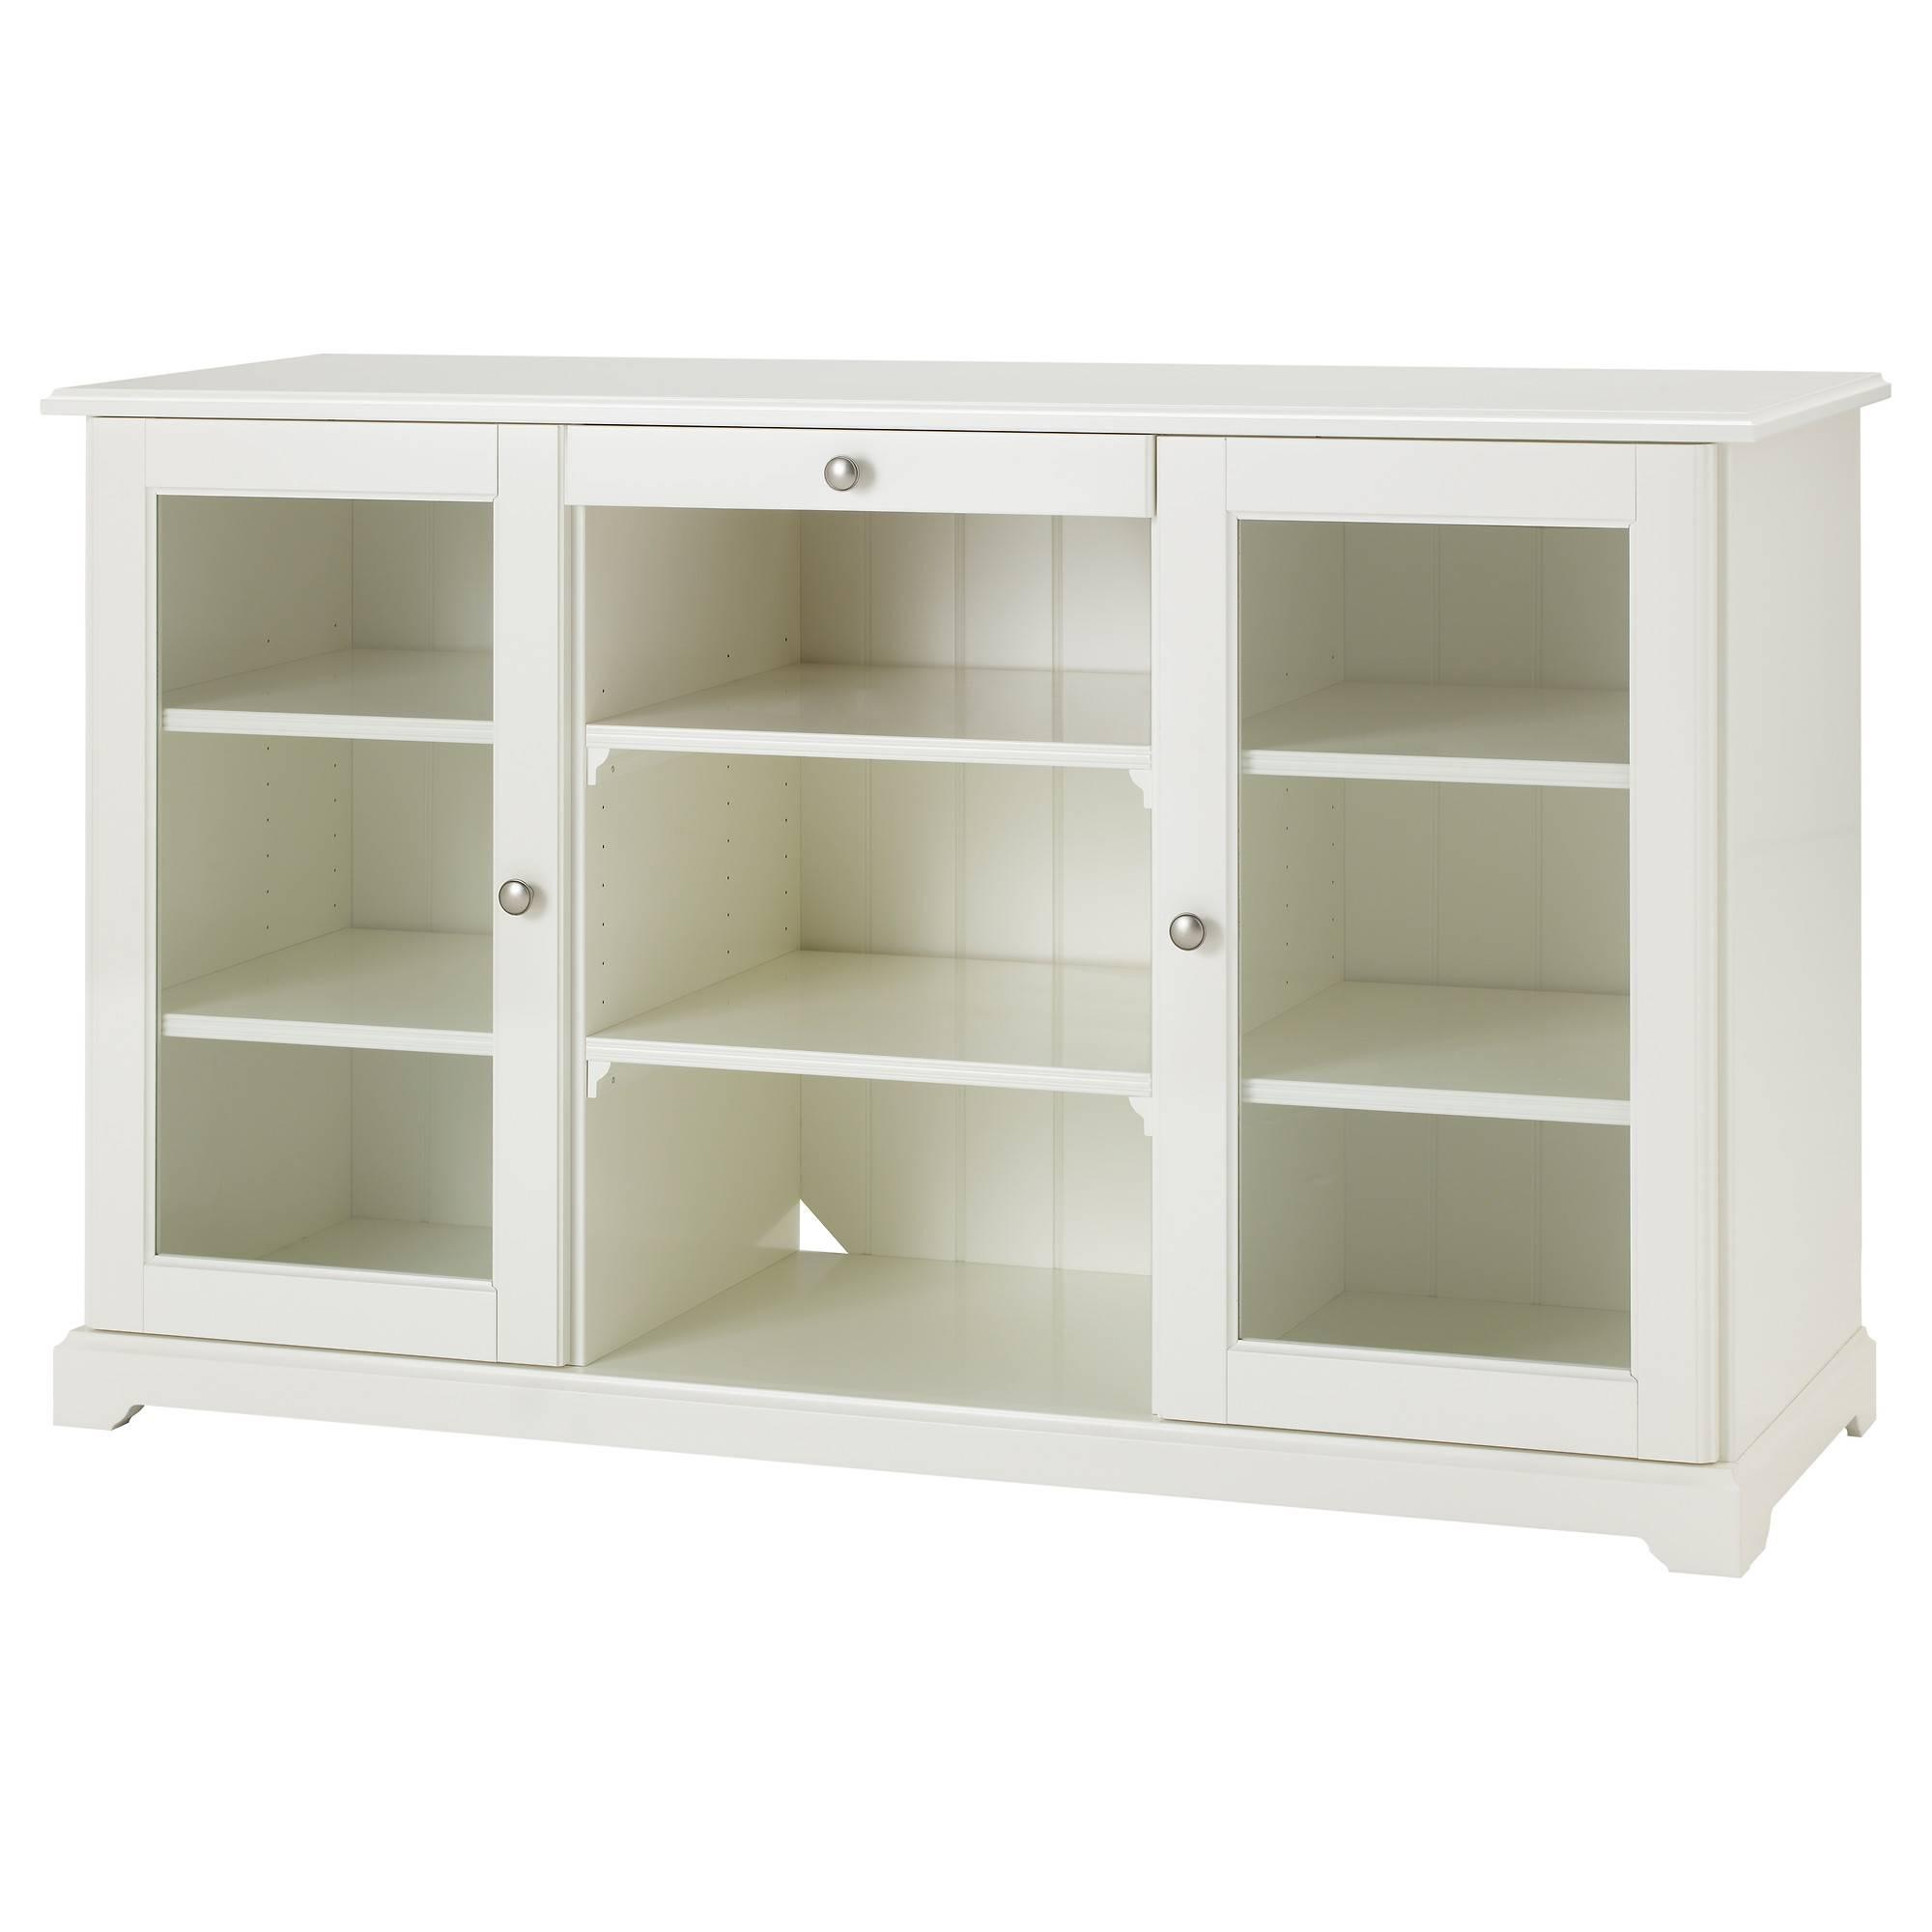 Sideboards: Marvellous Dark Sideboard Furniture Sideboard Buffet with regard to Dark Sideboards (Image 22 of 30)